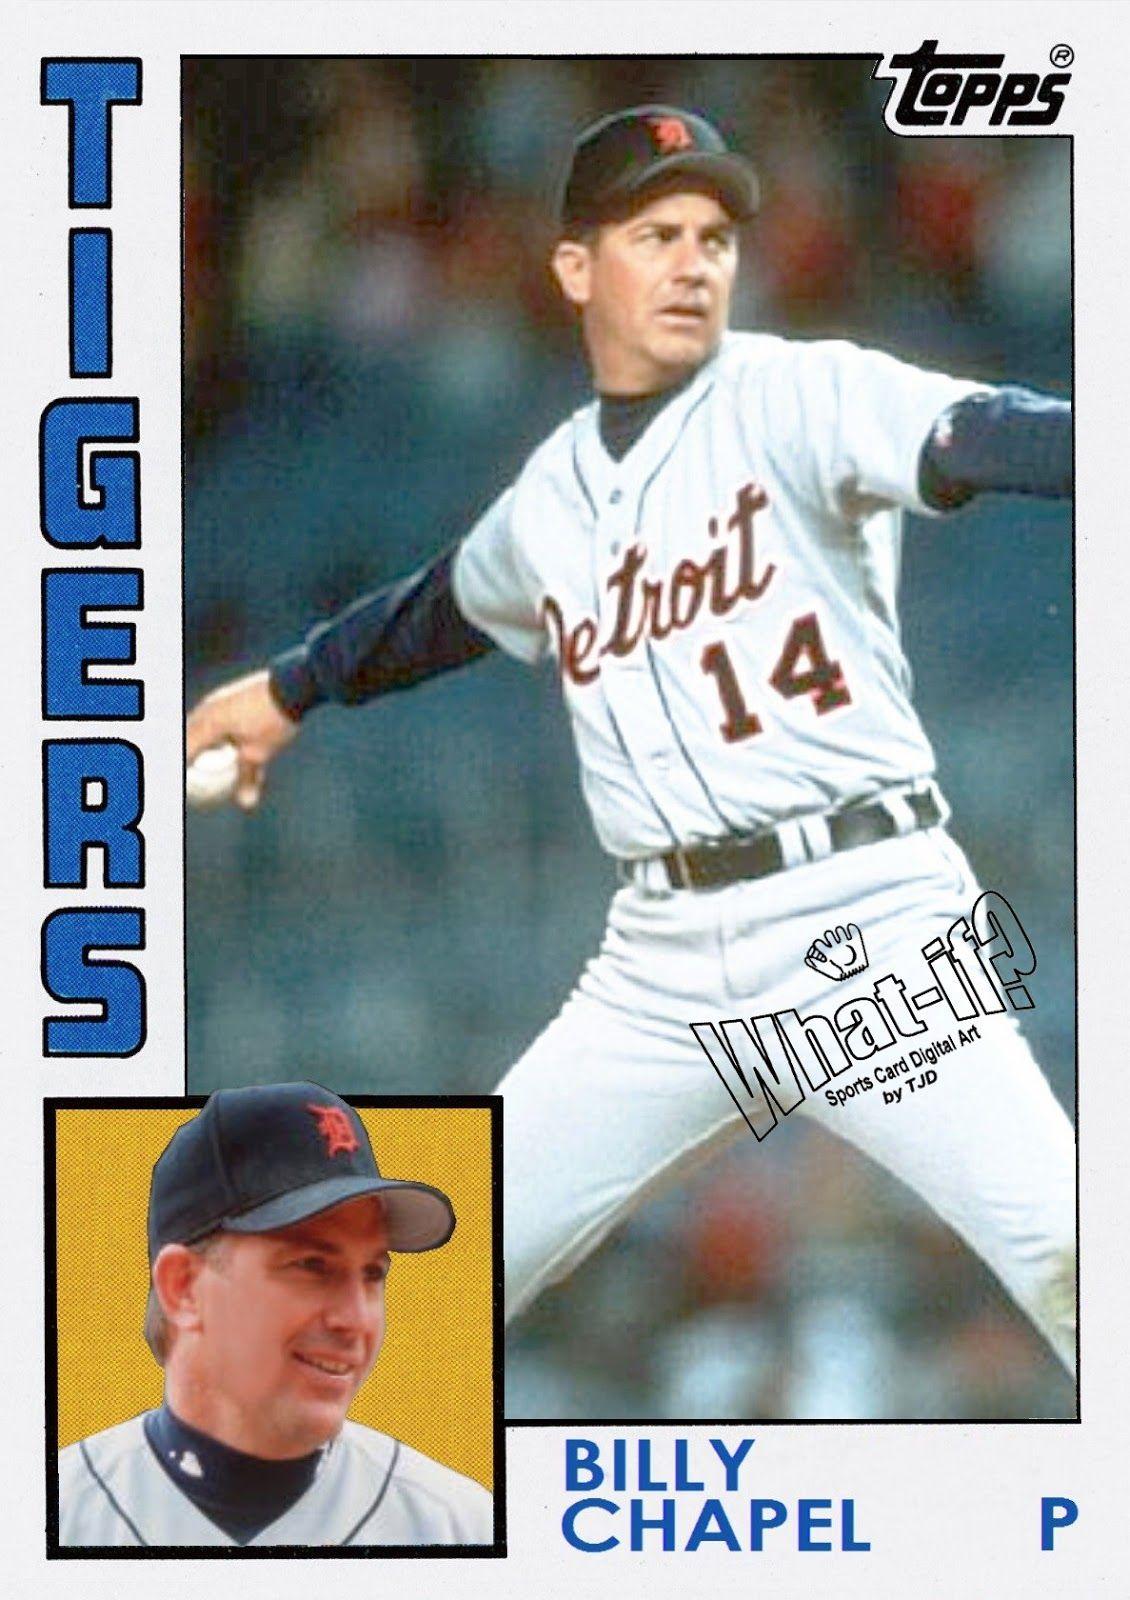 If Crash Davis had a brother... Baseball movies